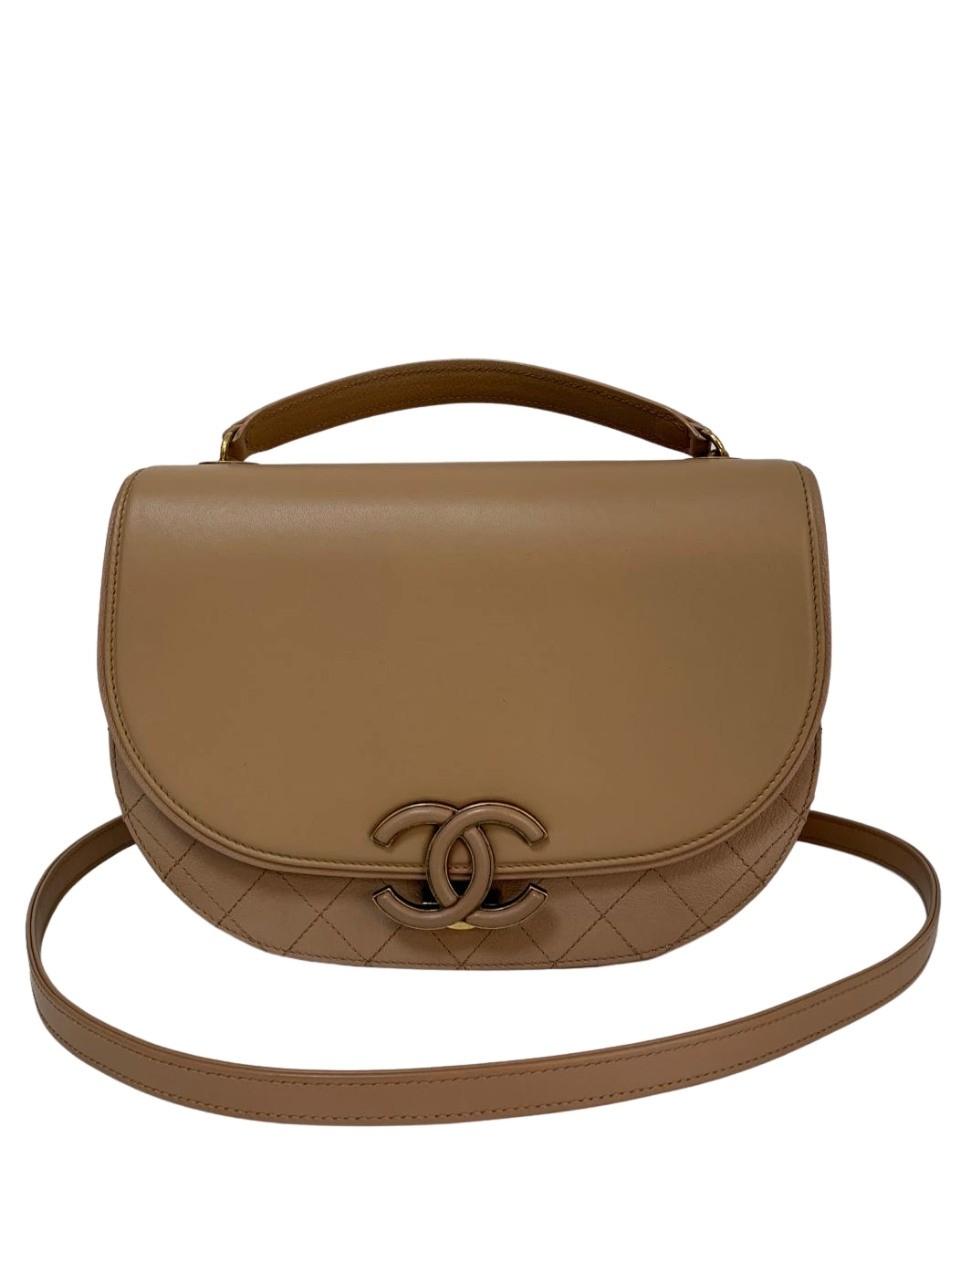 Bolsa Chanel Coco Curve Caramelo